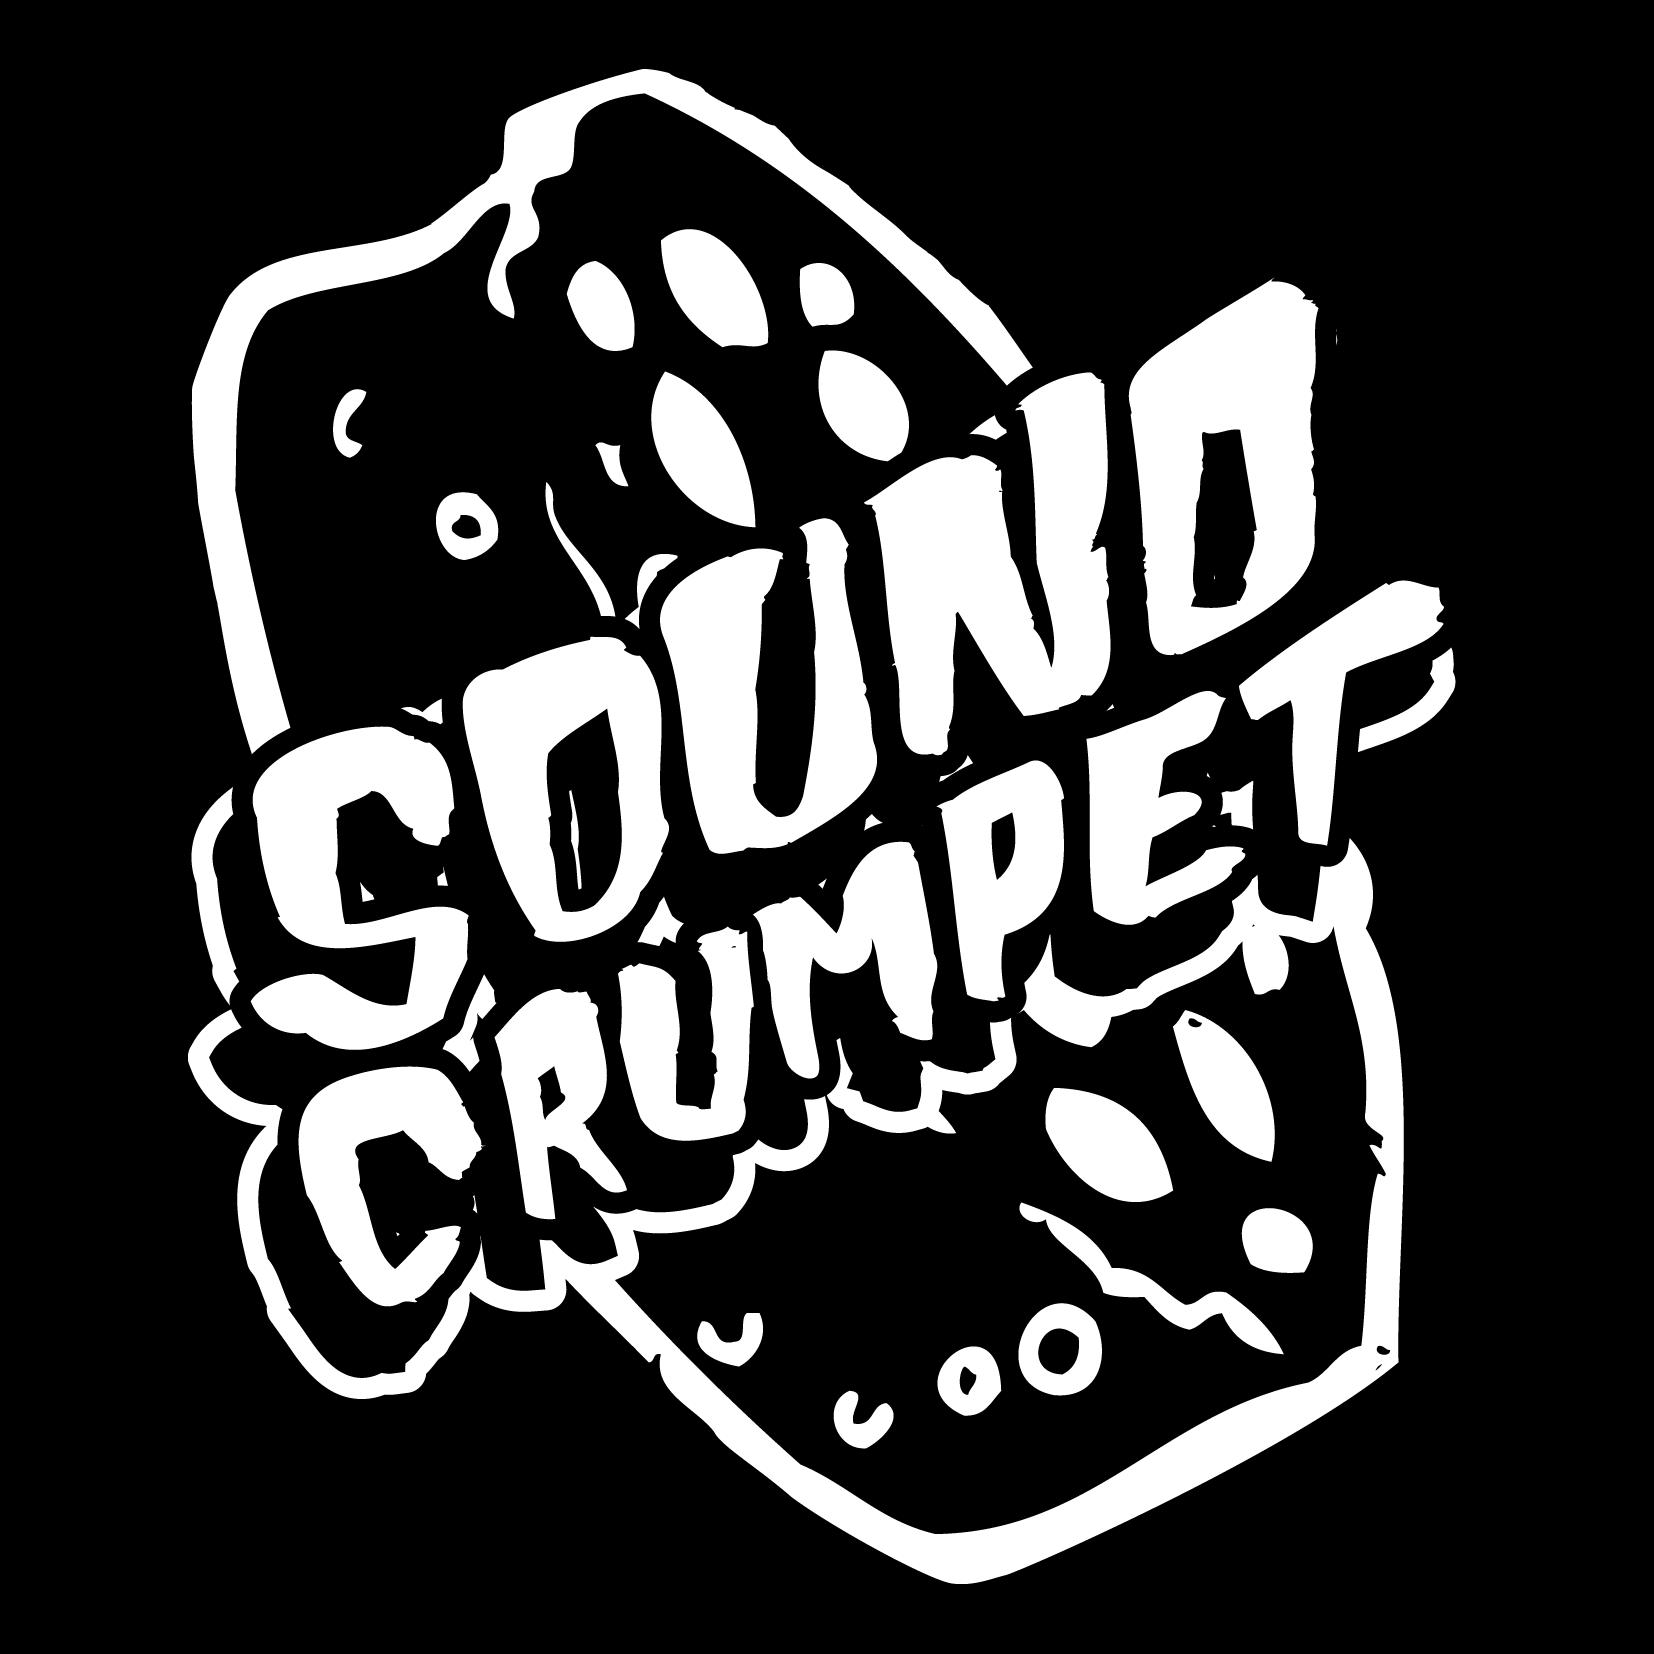 soundcrumpet